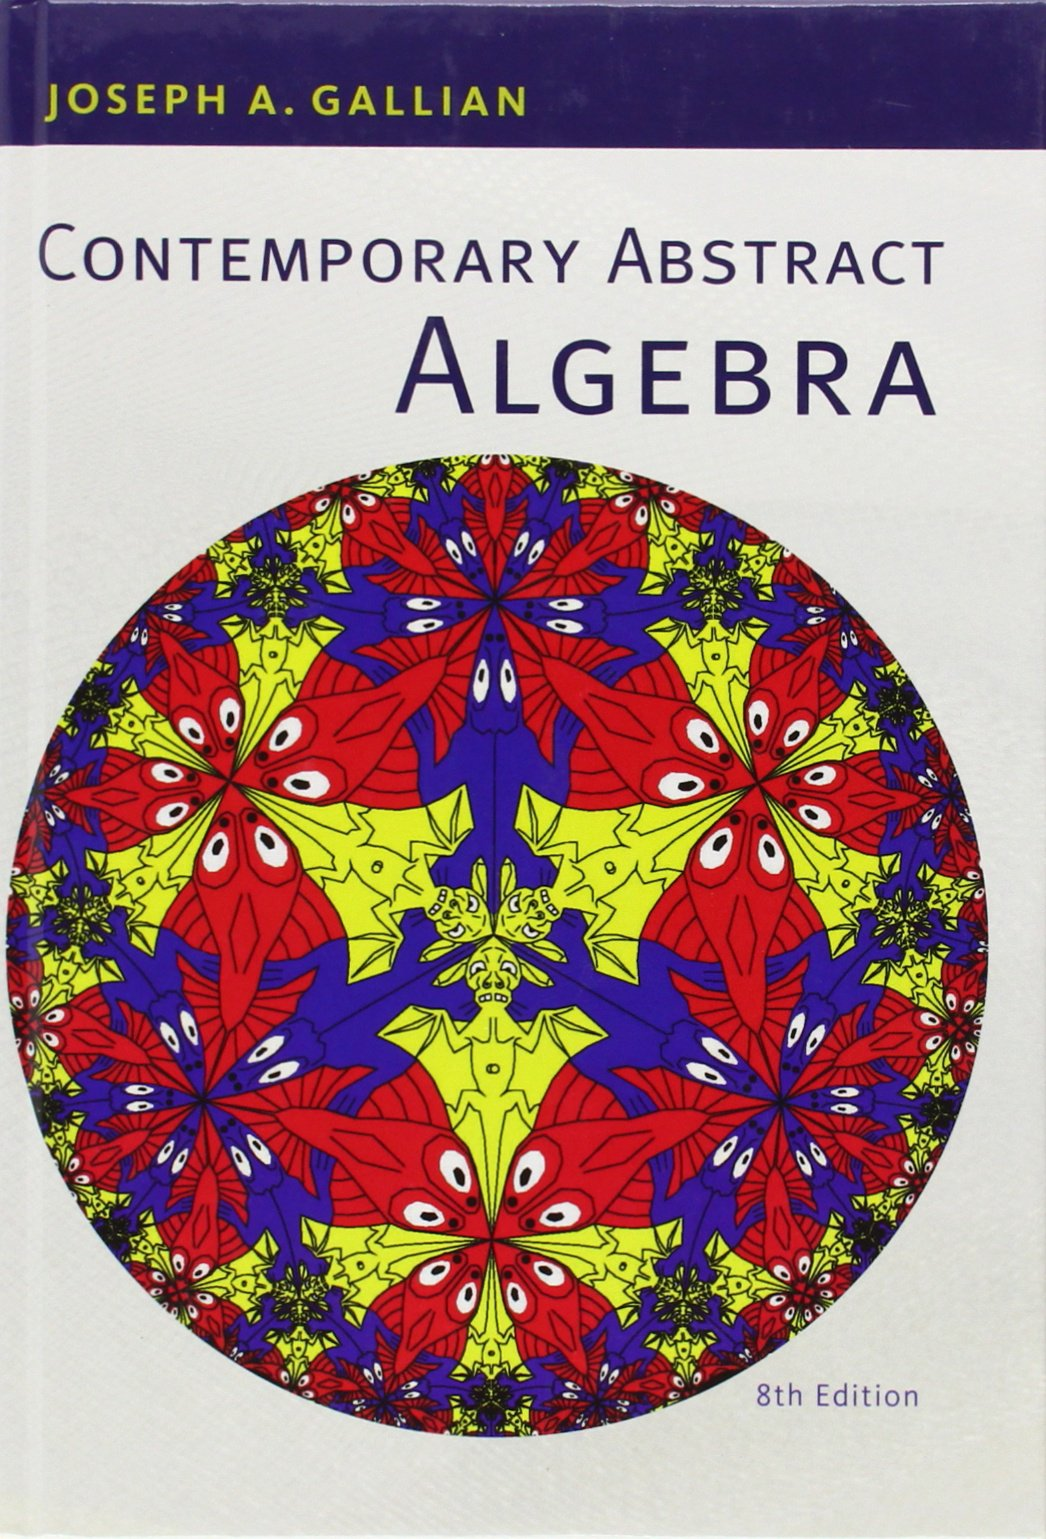 Contemporary Abstract Algebra: Joseph Gallian: 9781133599708: Books -  Amazon.ca